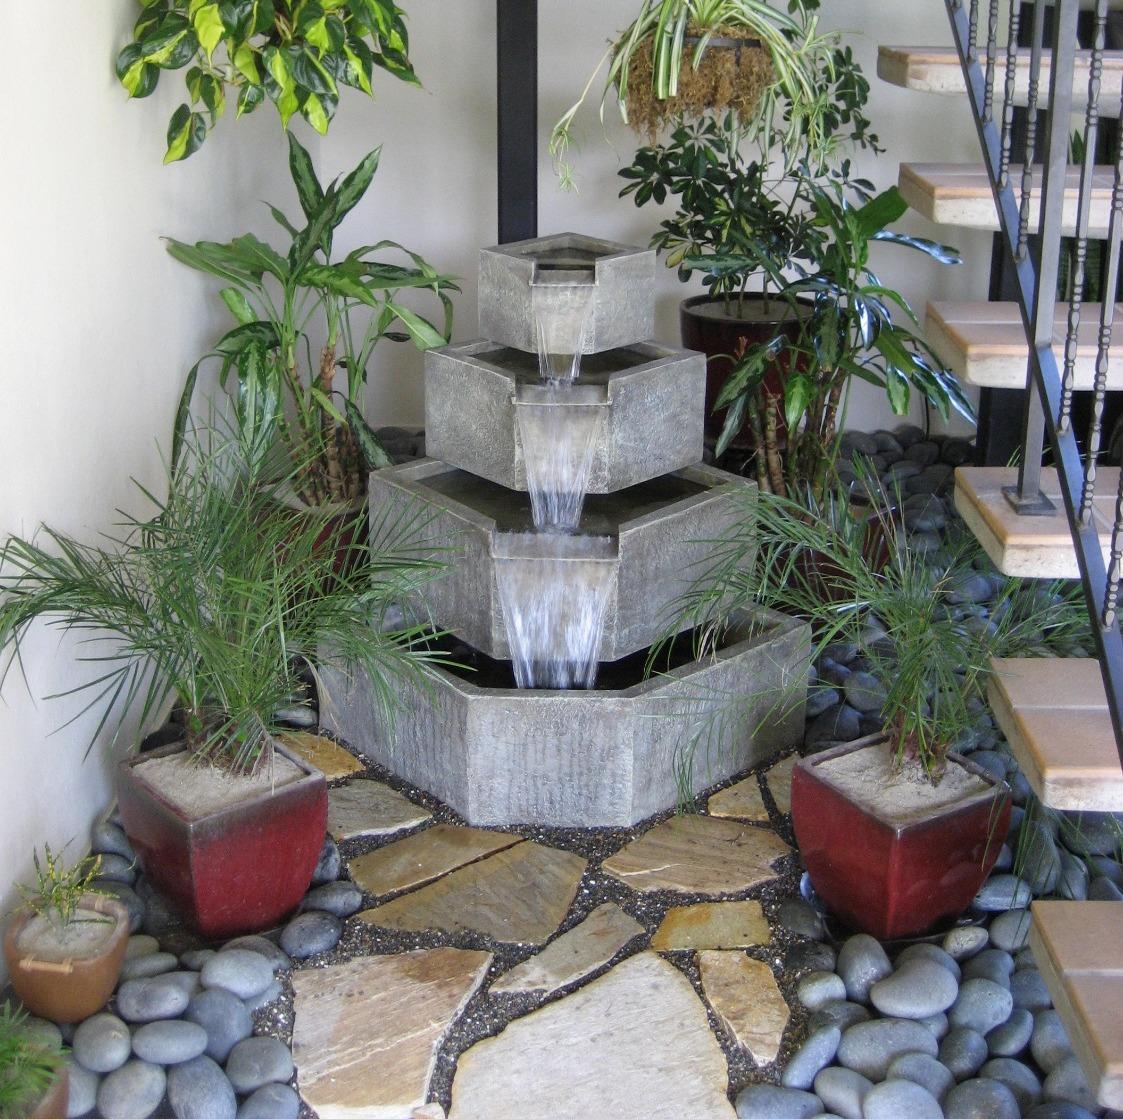 All Seasons Gardening & Landscaping image 25